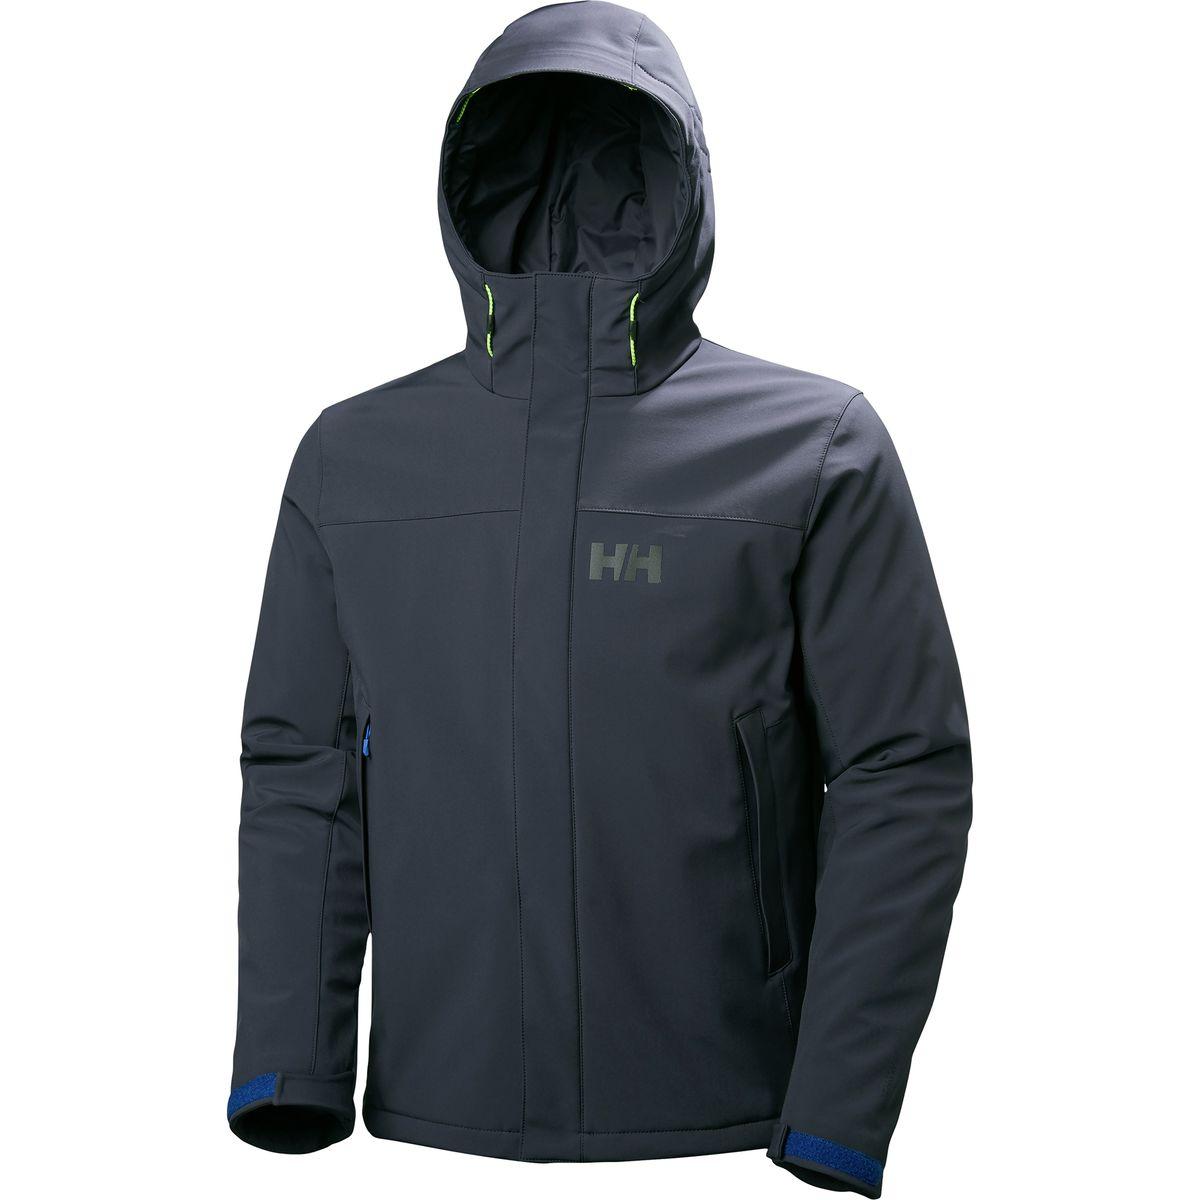 Helly Hansen Forseti Insulated Softshell Jacket - Men